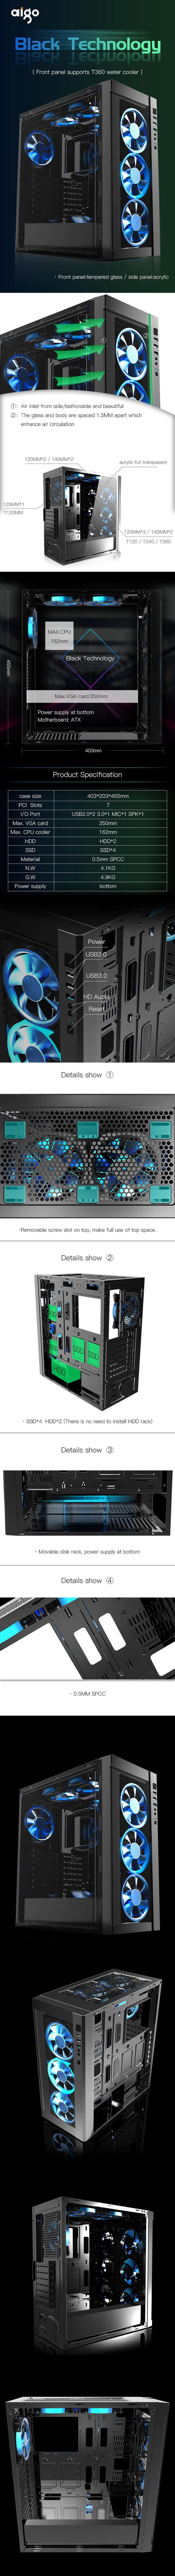 Vỏ case máy tính AIGO Black Technology